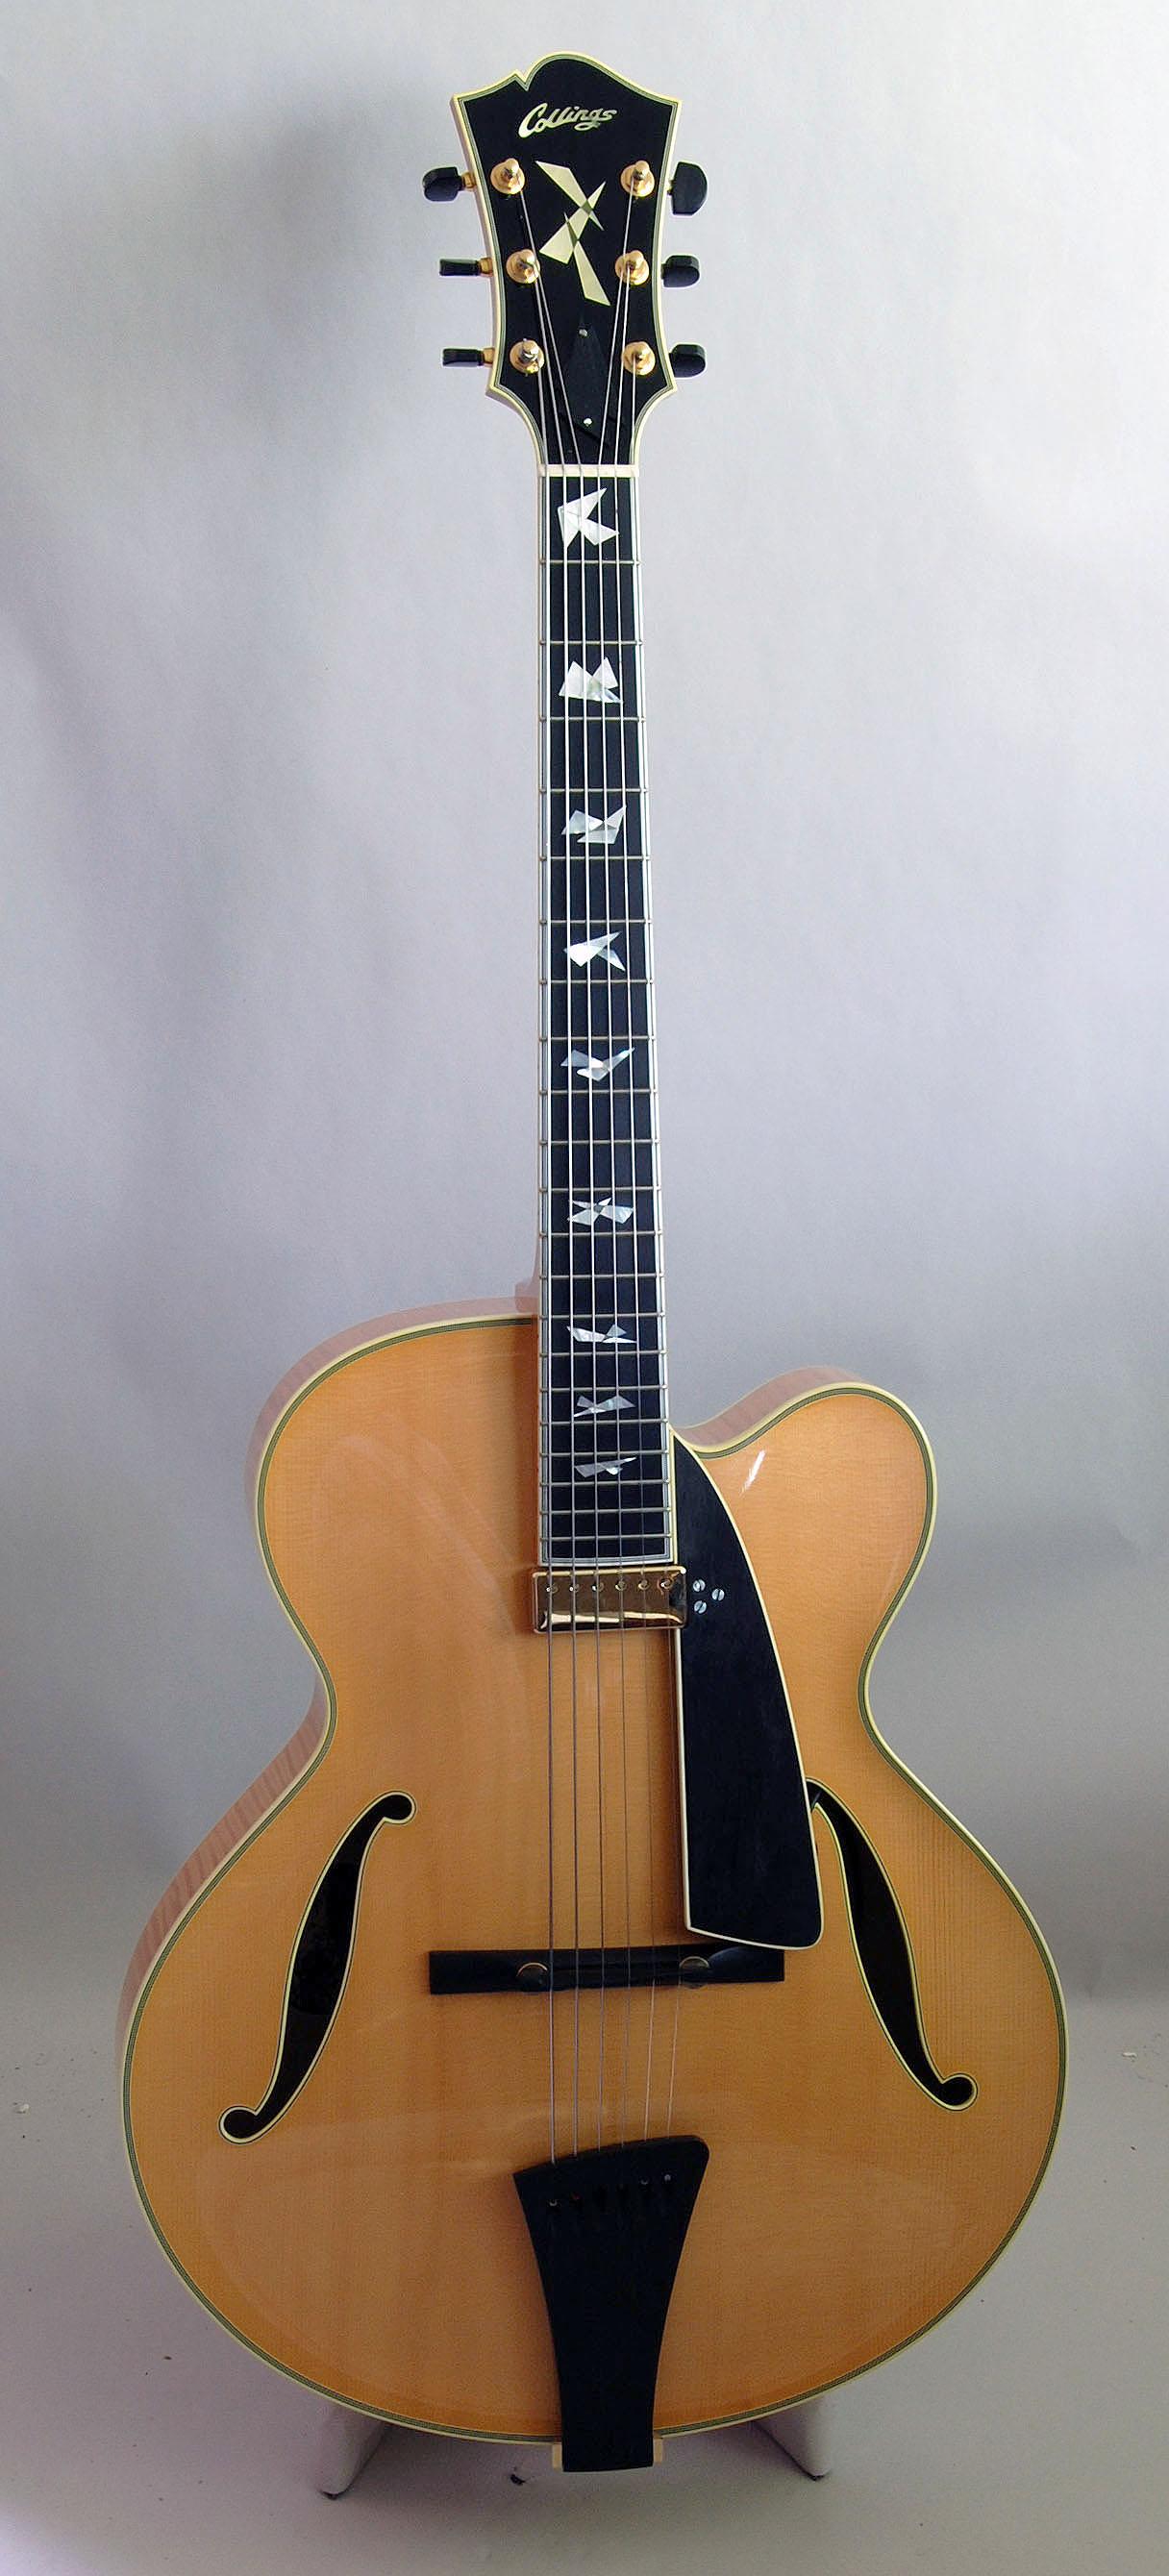 collings at 17 guitar for sale. Black Bedroom Furniture Sets. Home Design Ideas